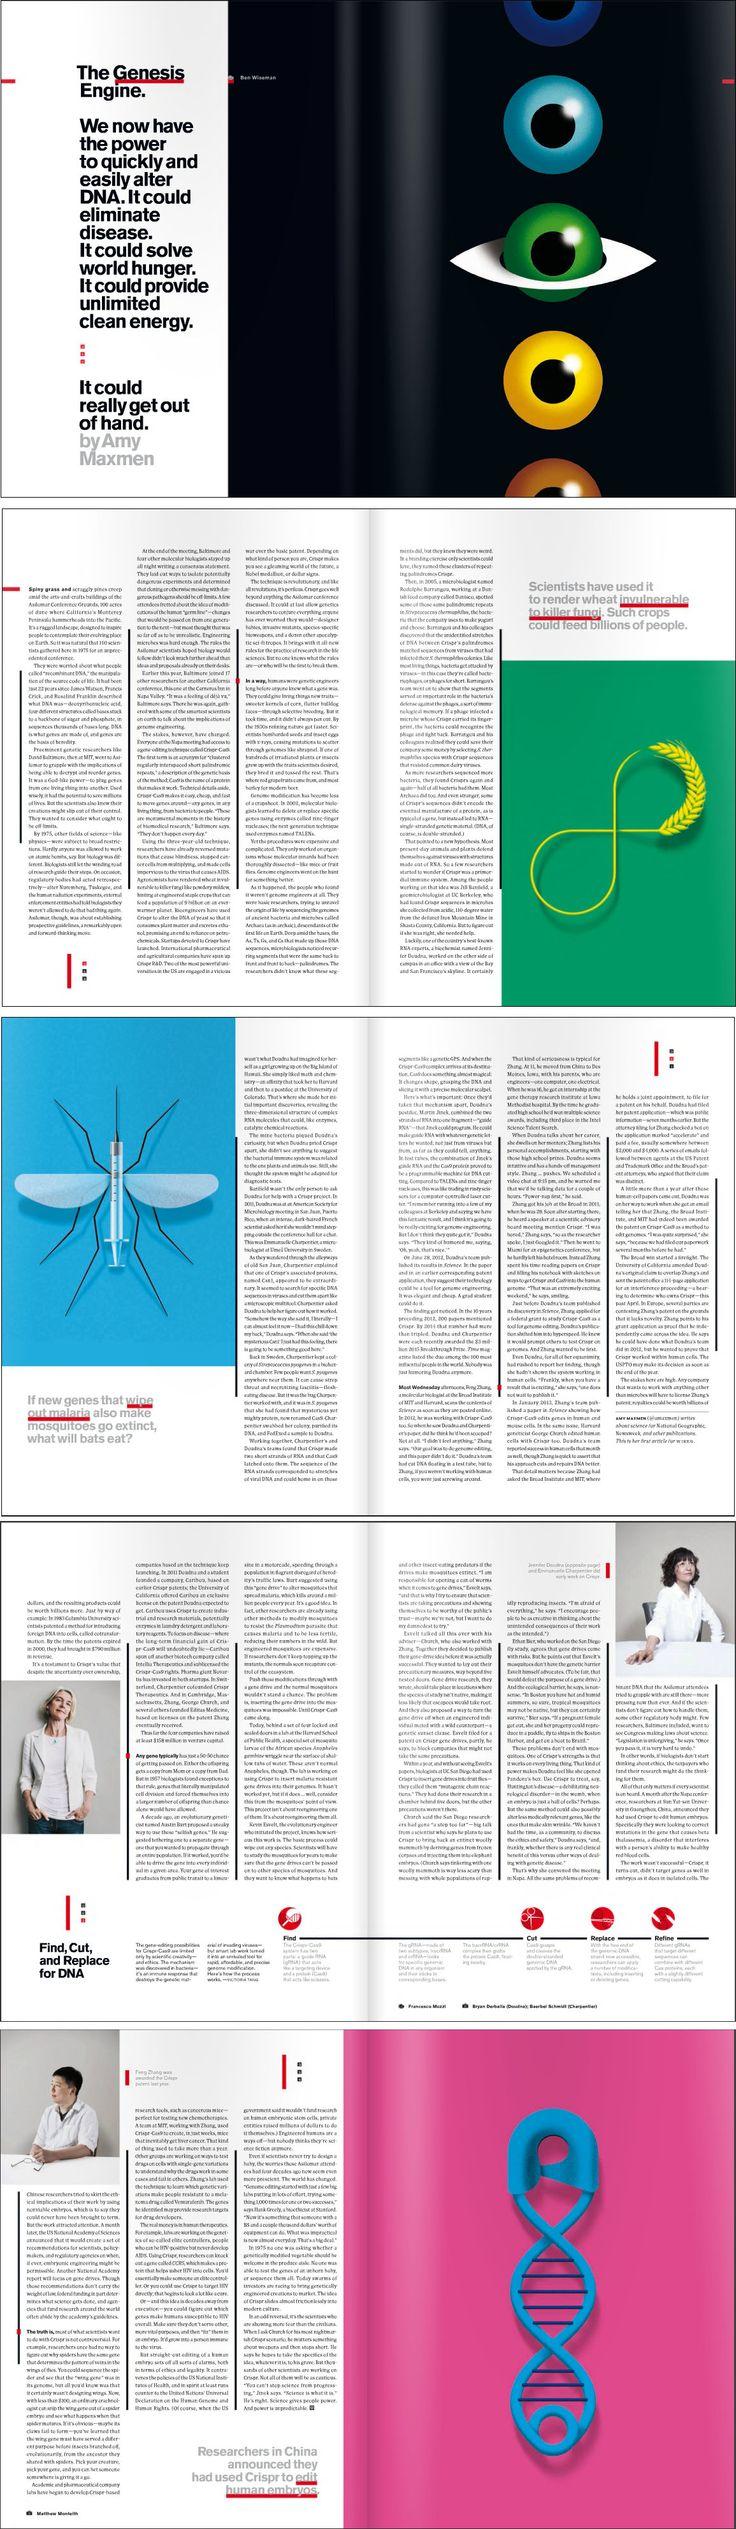 216 best Wired magazine images on Pinterest | Editorial design ...